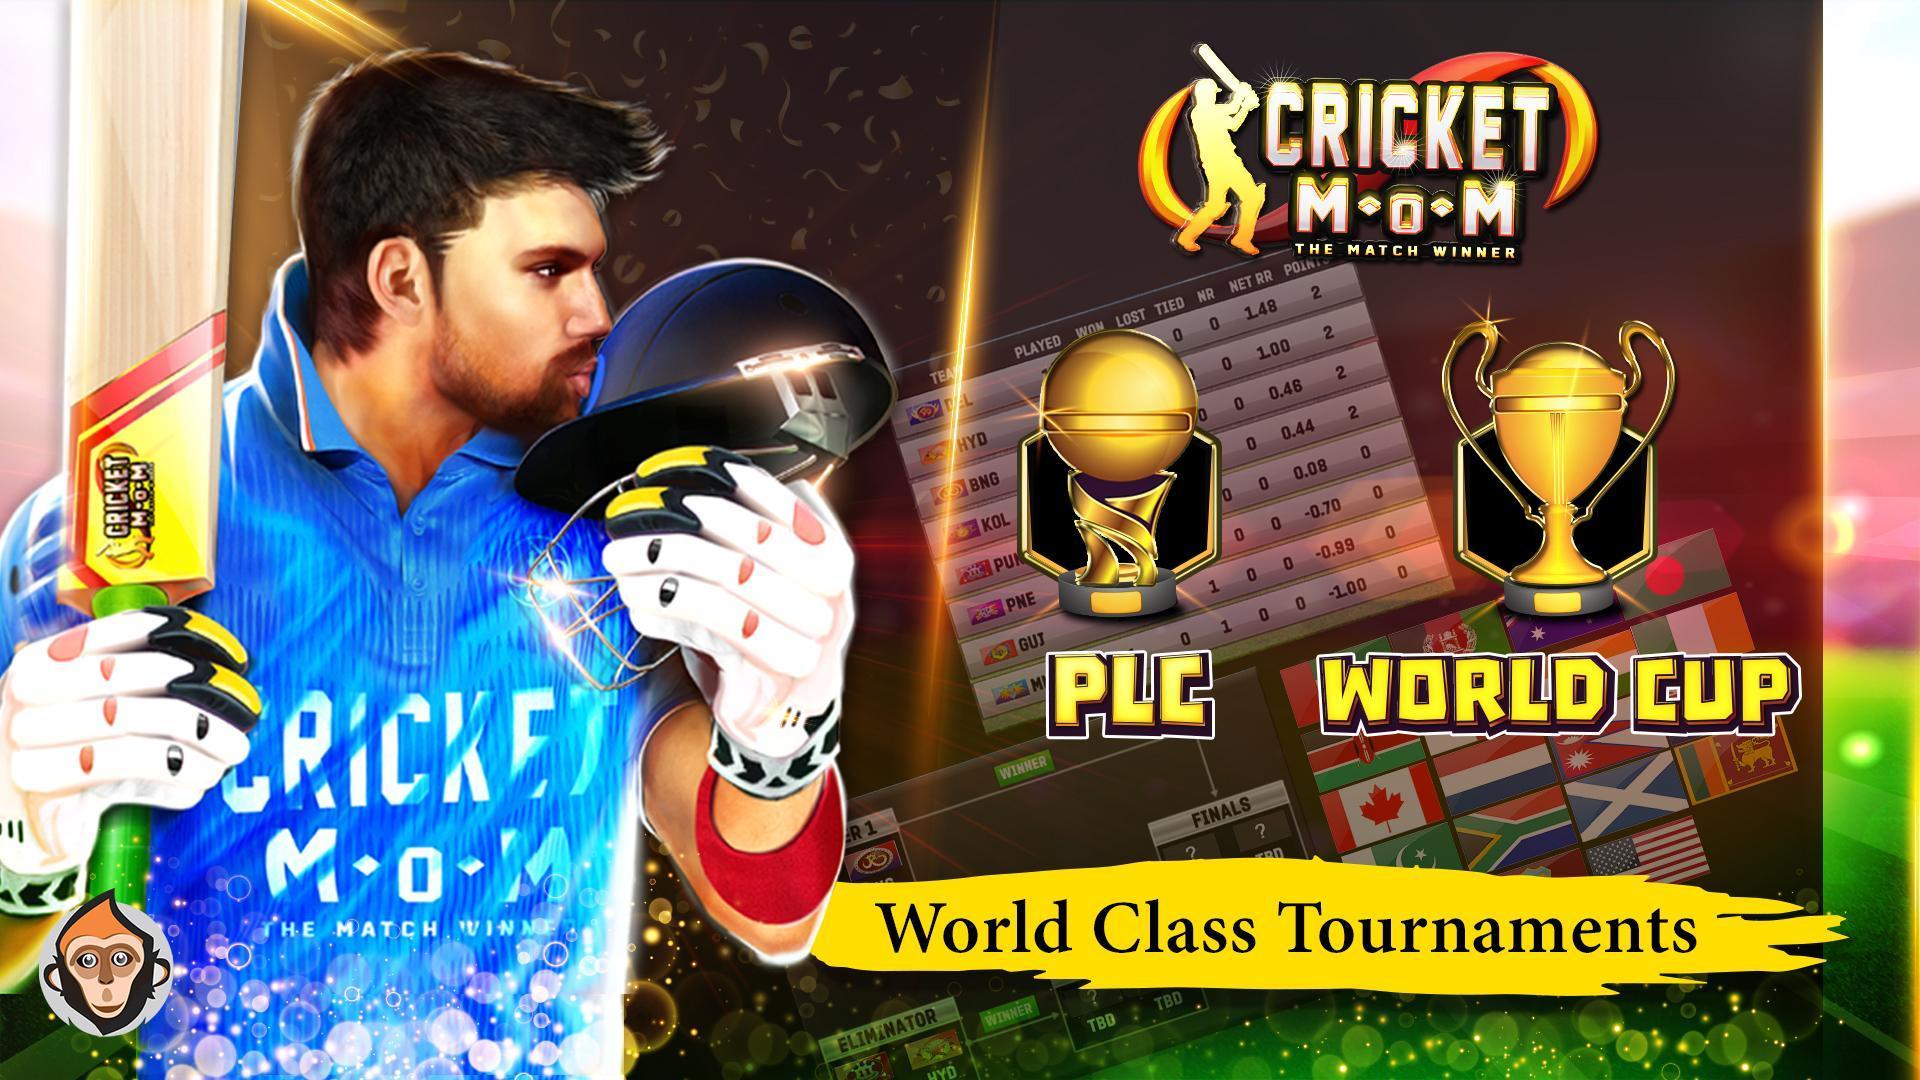 Cricket man of the match betting usa google bets on quantum computing